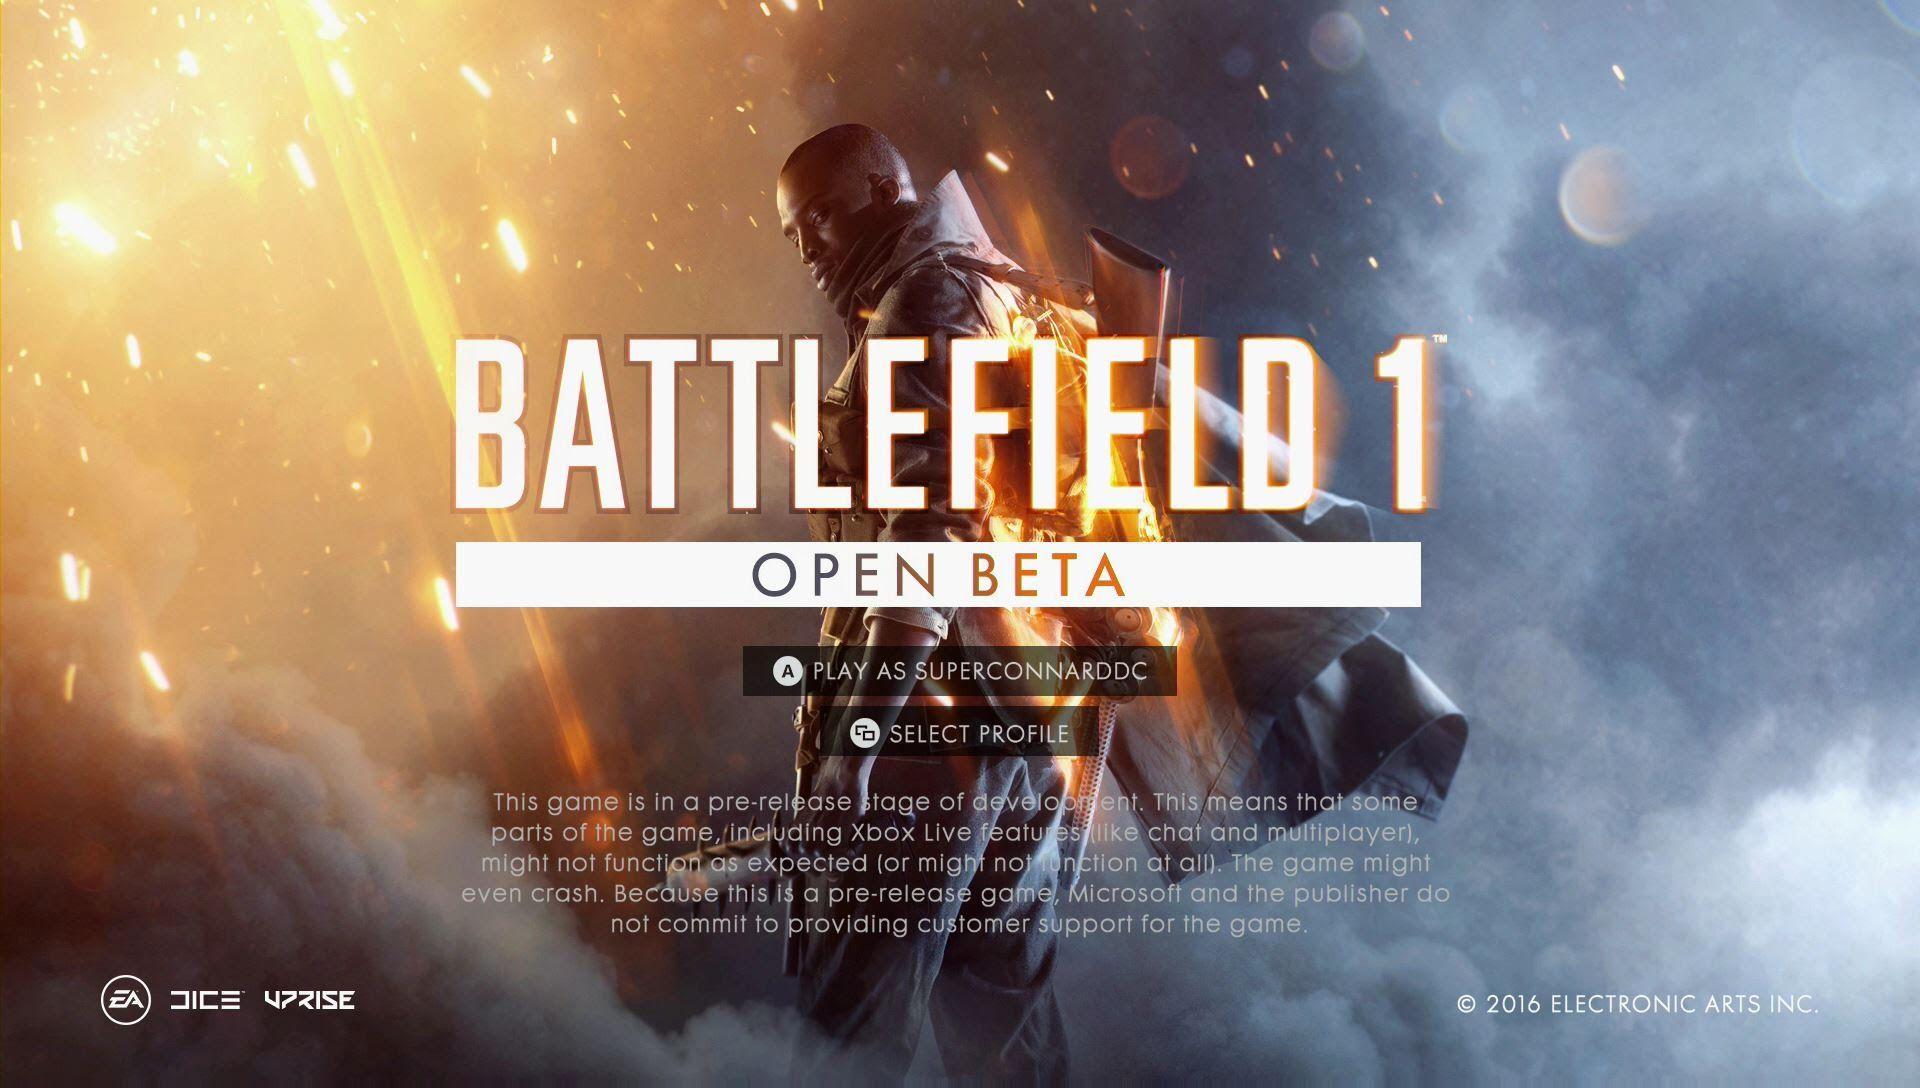 Battlefield 1 ONLINE XBOX ONE Battlefield 1, Battlefield